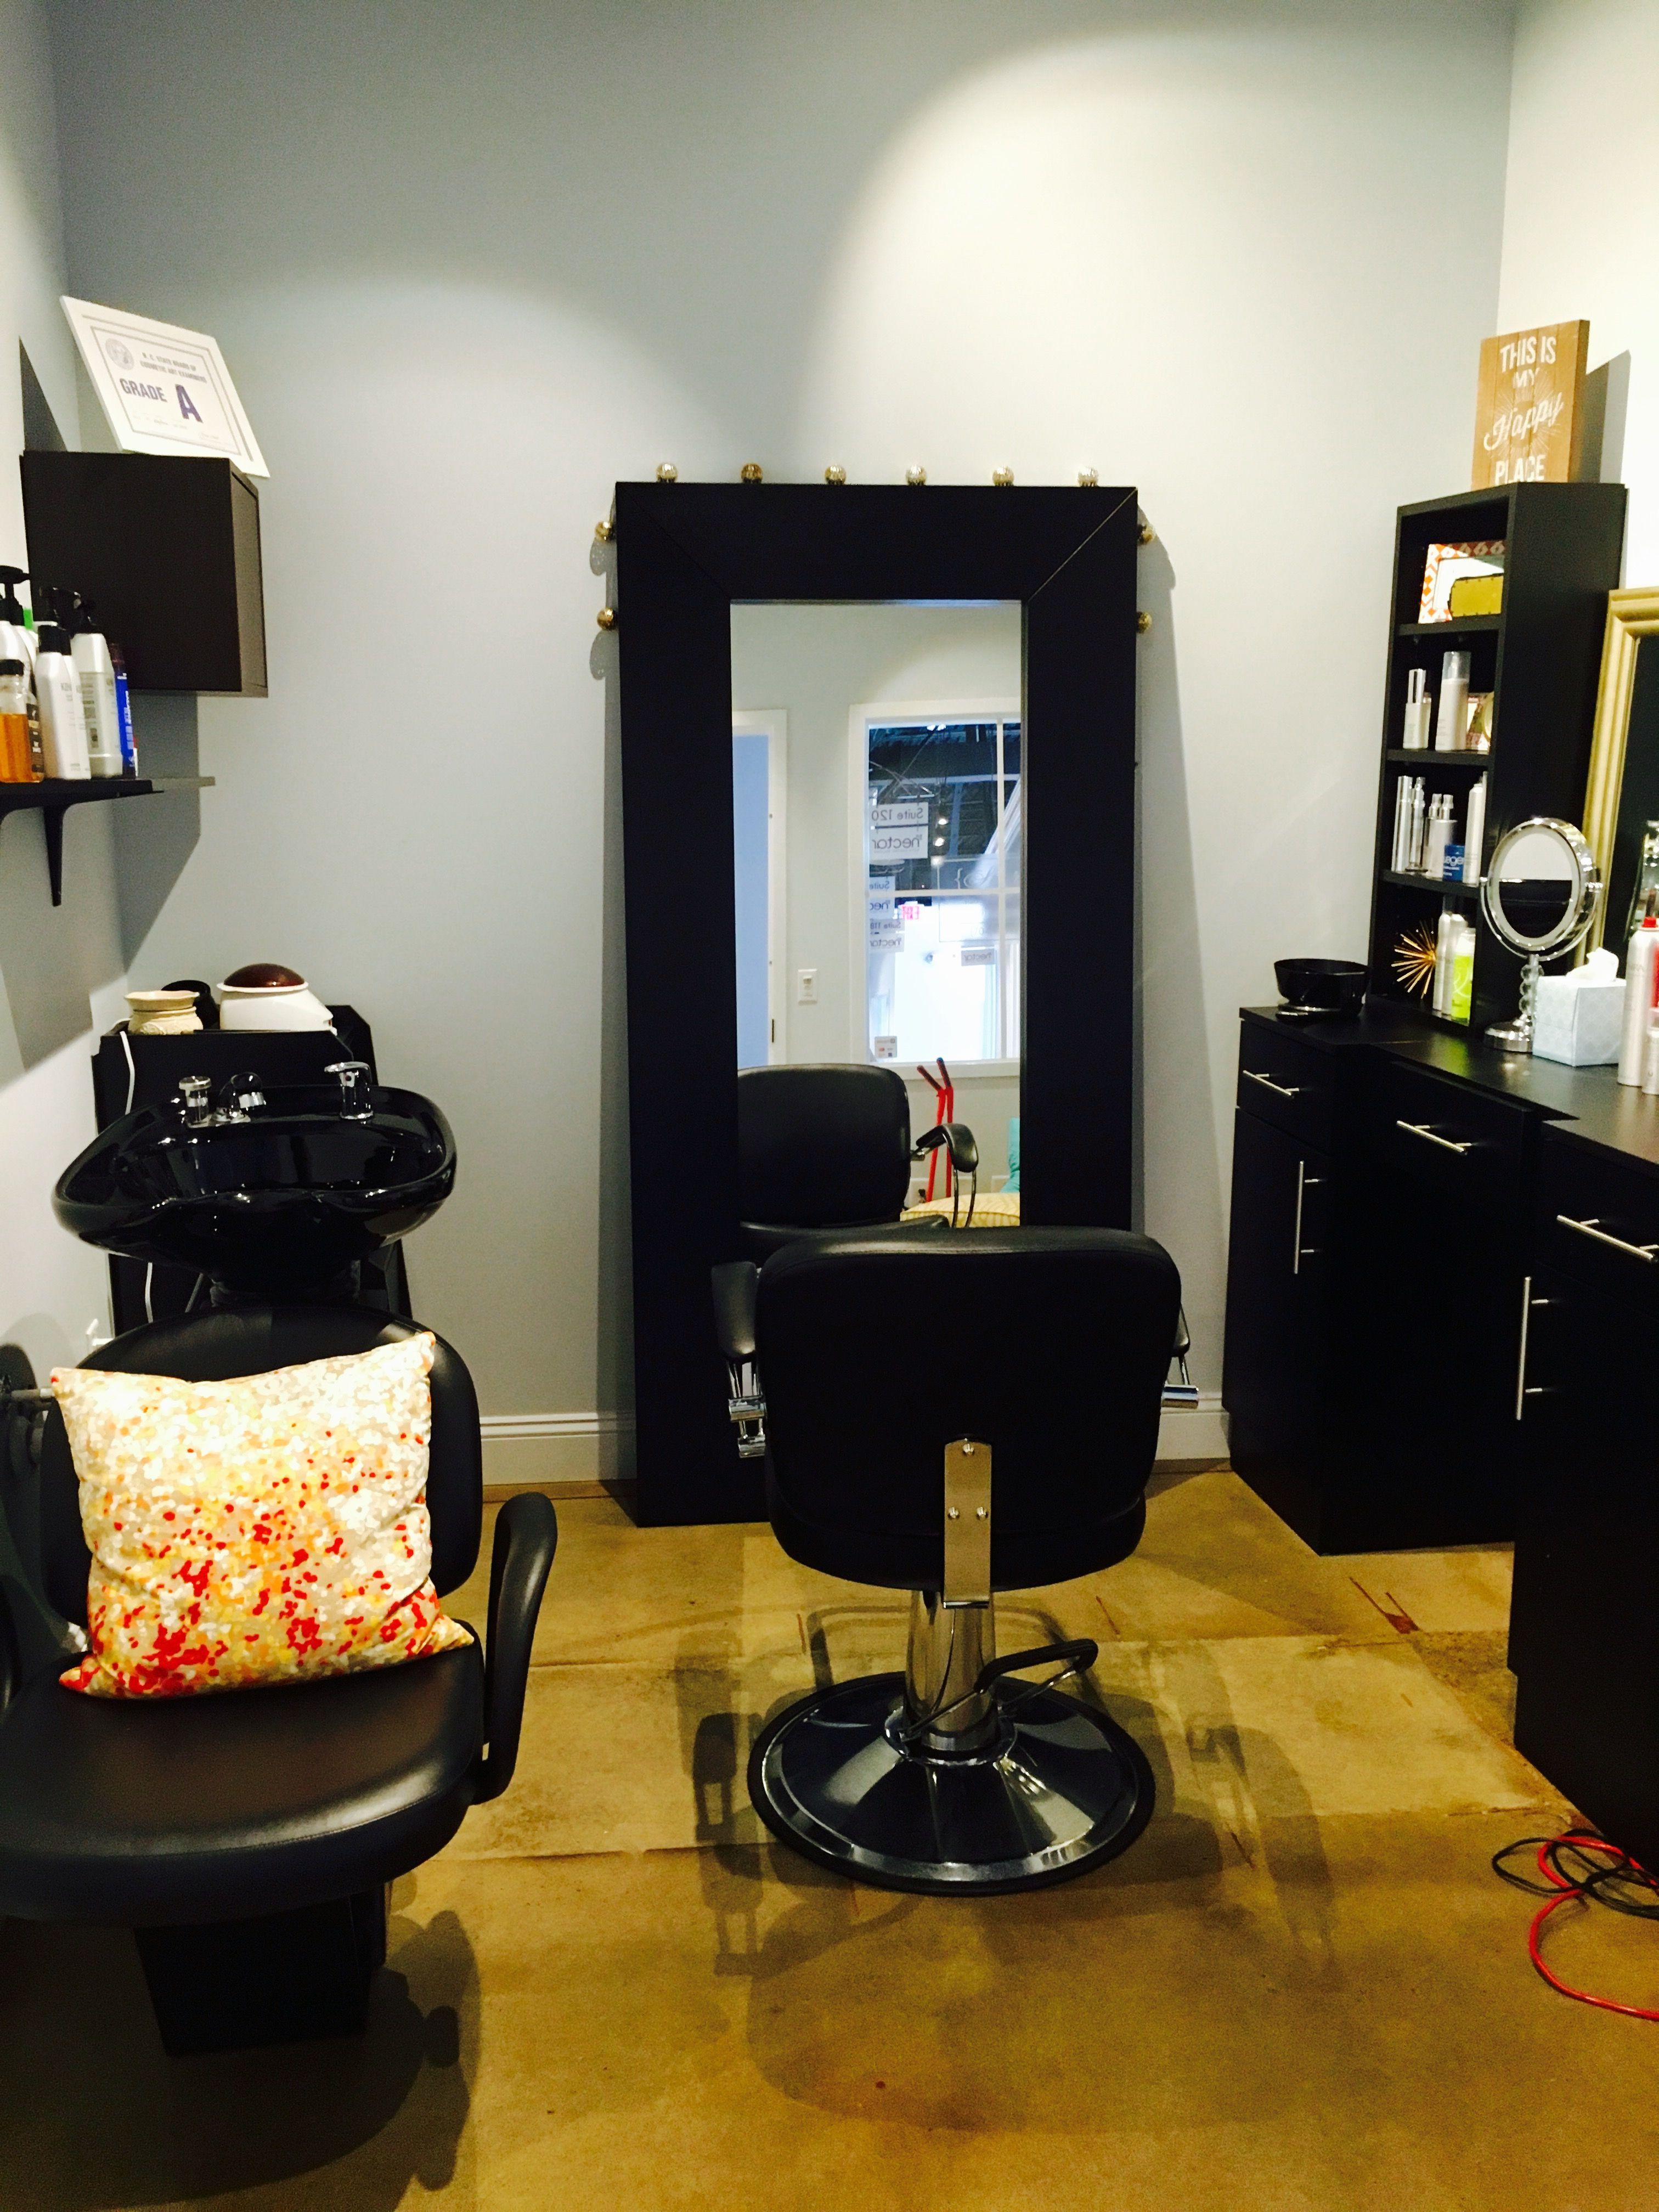 Suite 131 Boldandbeautiful Creativity Decorchic Designyourownspace Cosmetologist Salon Suites Decor Salon Decor Studio Beauty Salon Decor